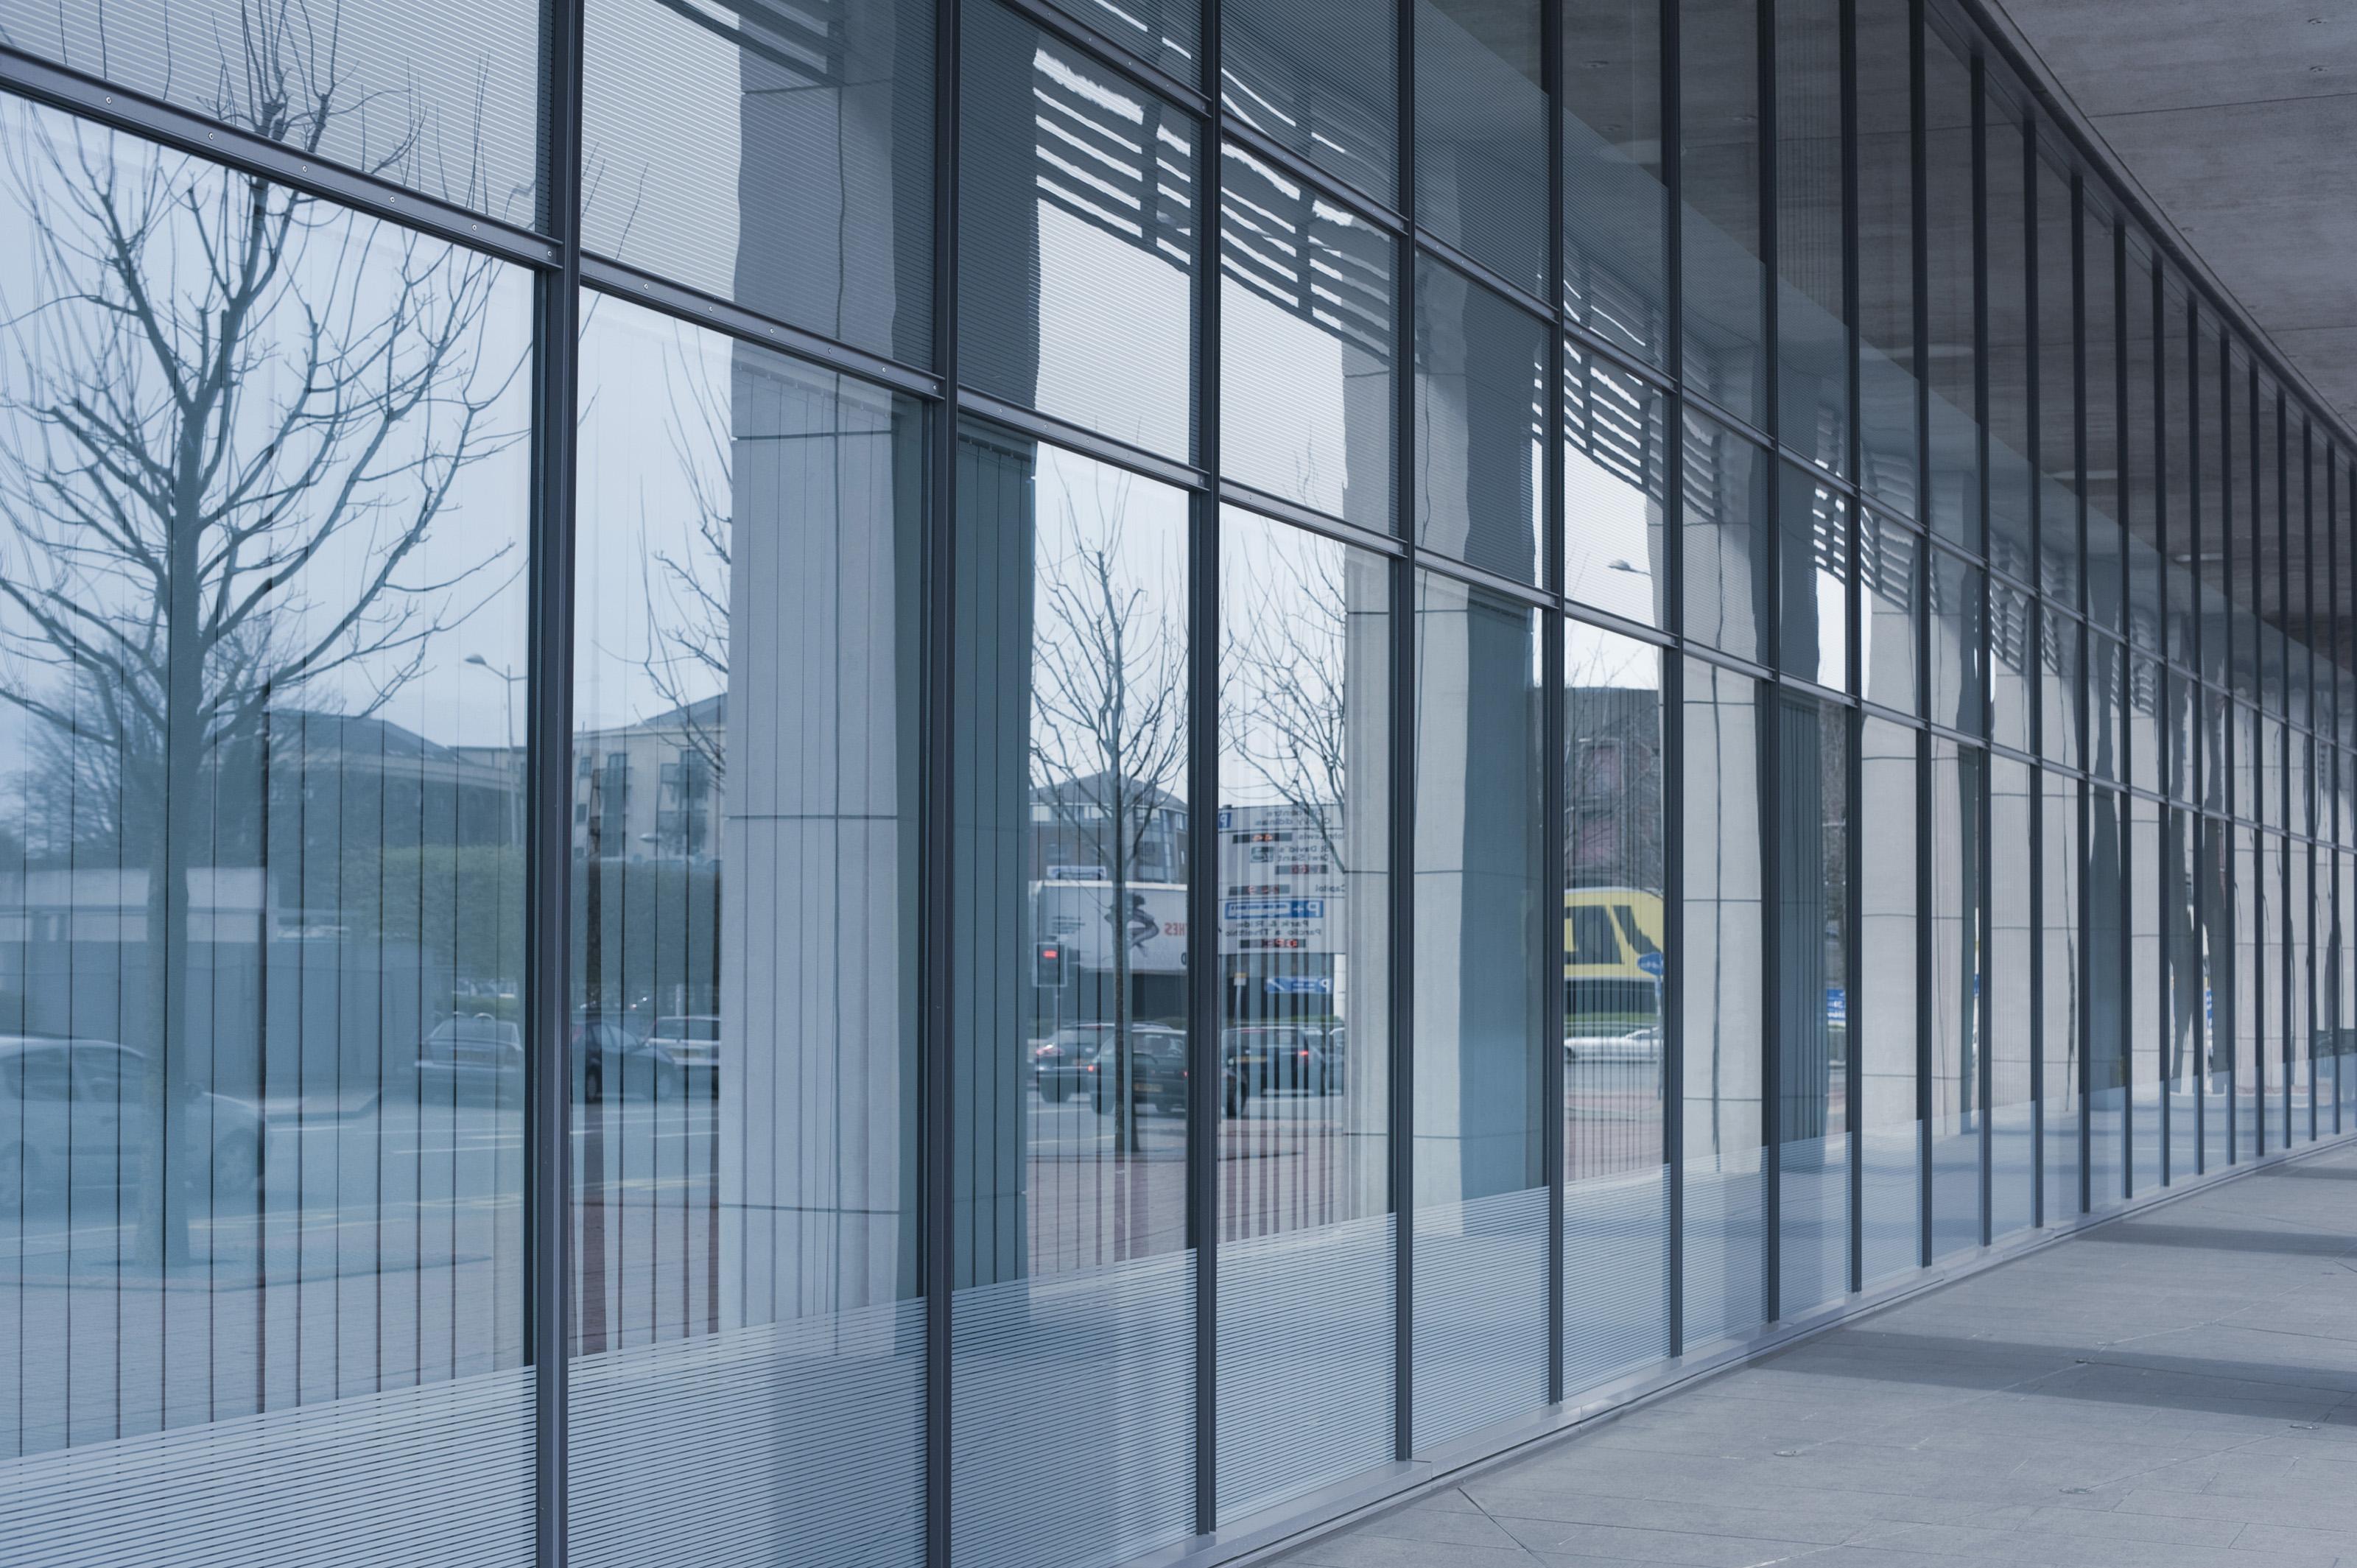 Building glass7258 Stockarch Free Stock Photos